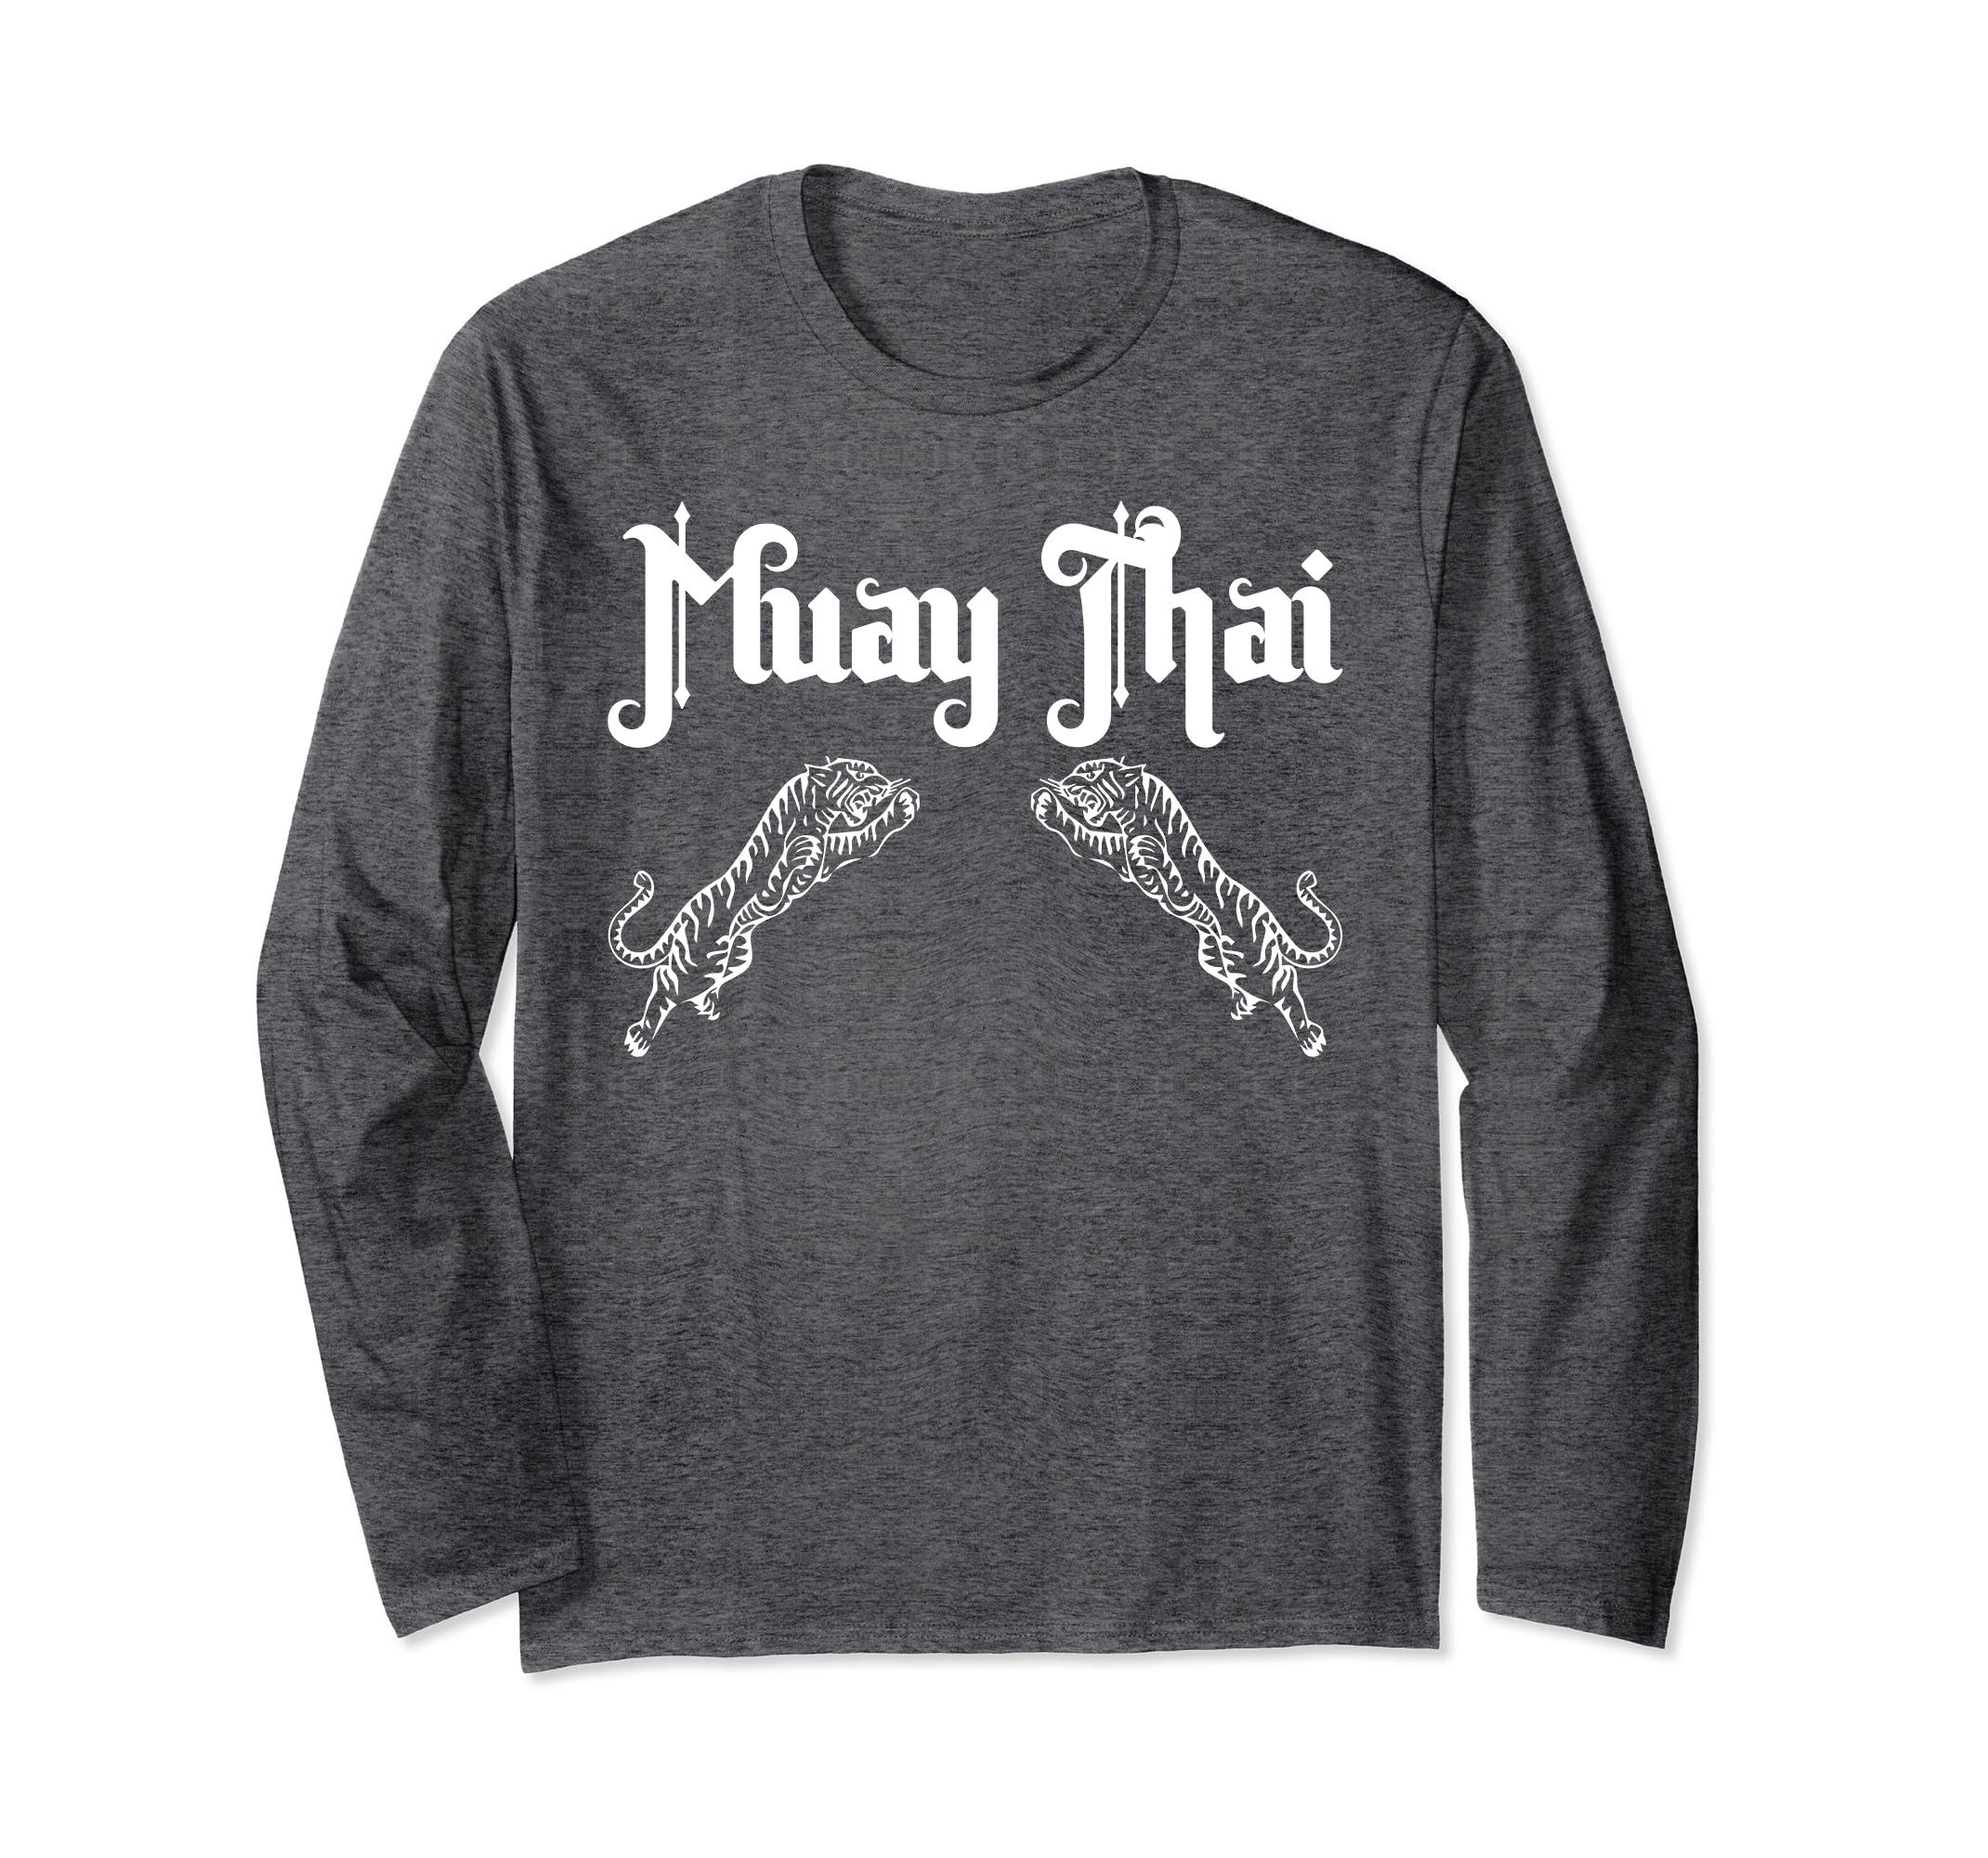 Muay Thai Tiger Long Sleeve T Shirt-Bawle